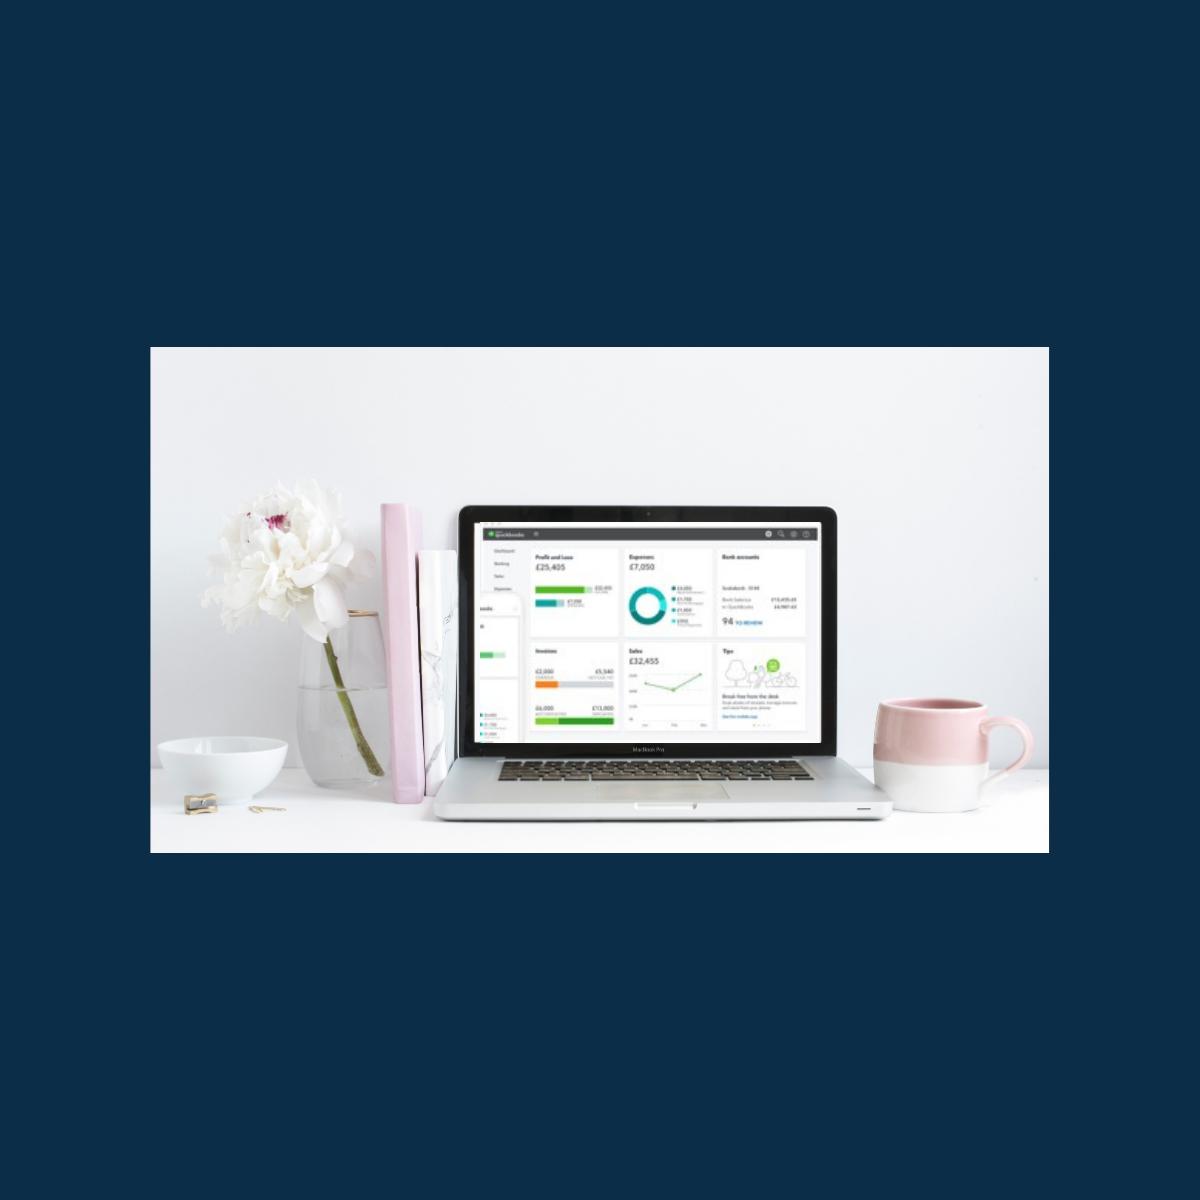 Online training on laptop